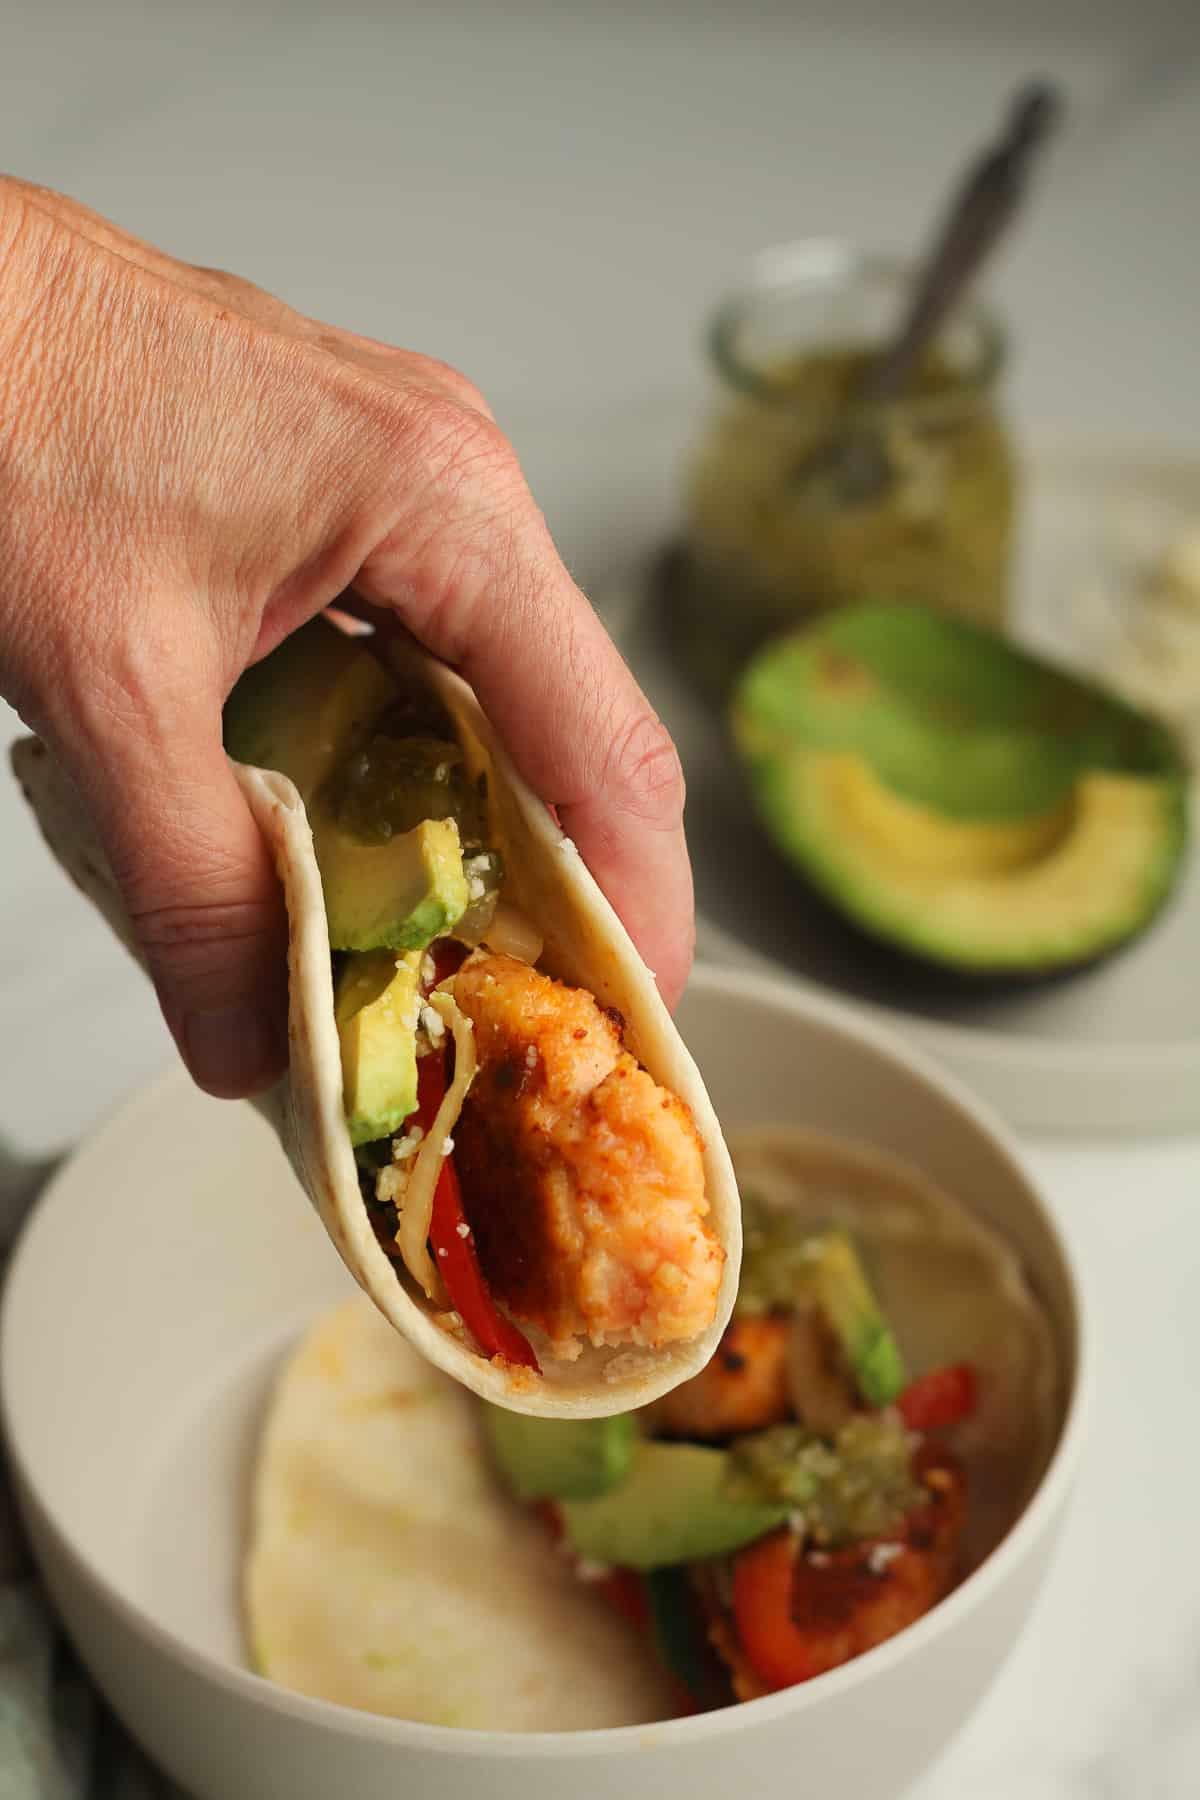 My hand holding a blackened salmon taco.